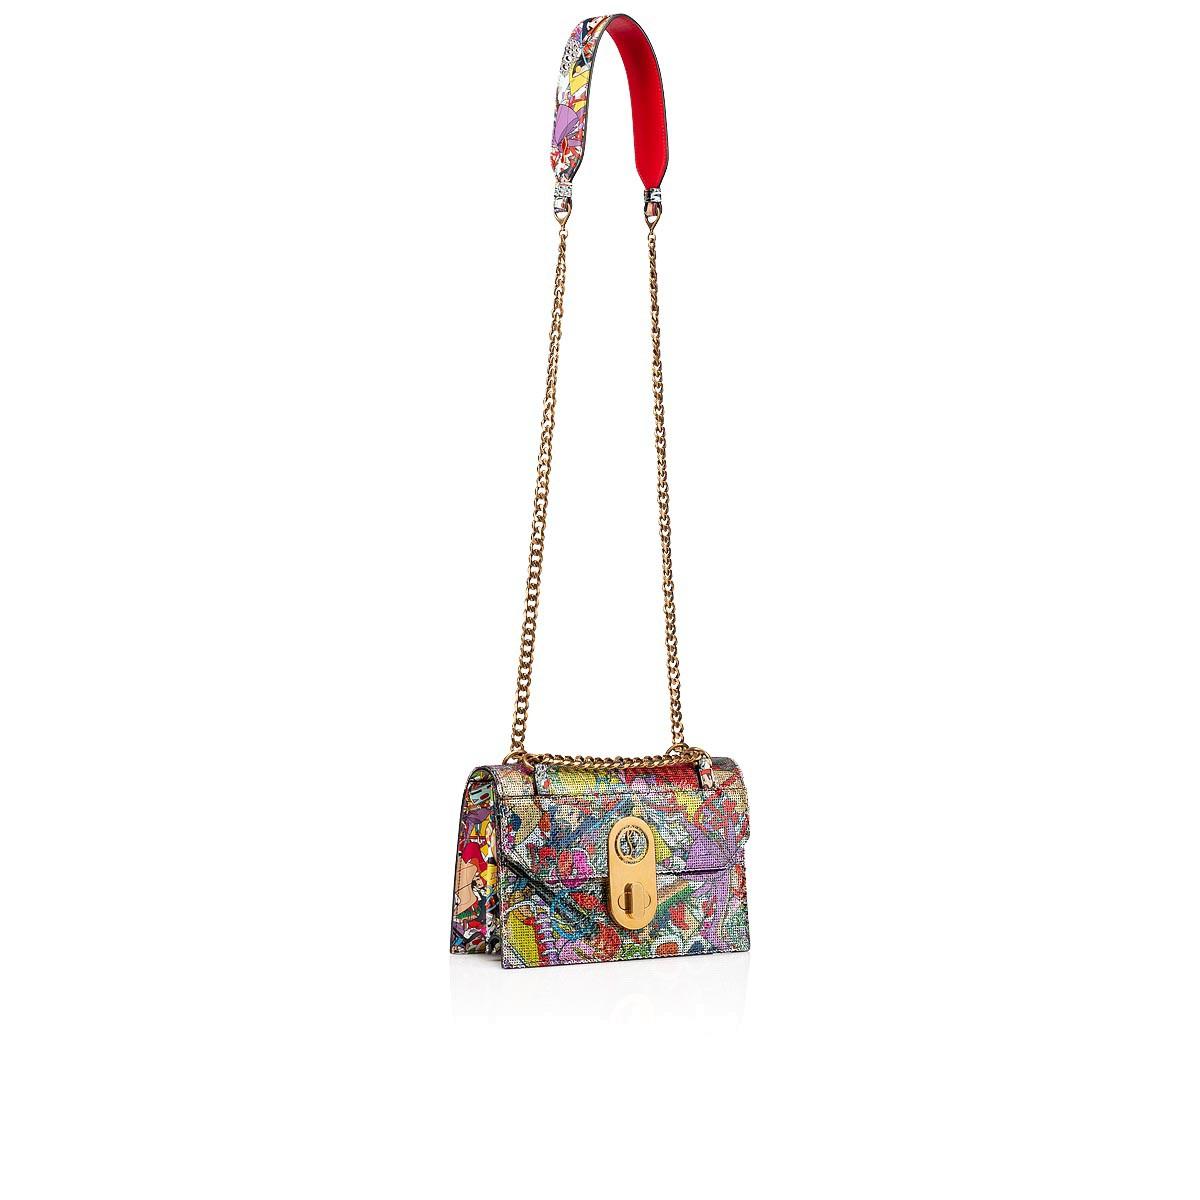 Bags - Elisa Small Paillette - Christian Louboutin